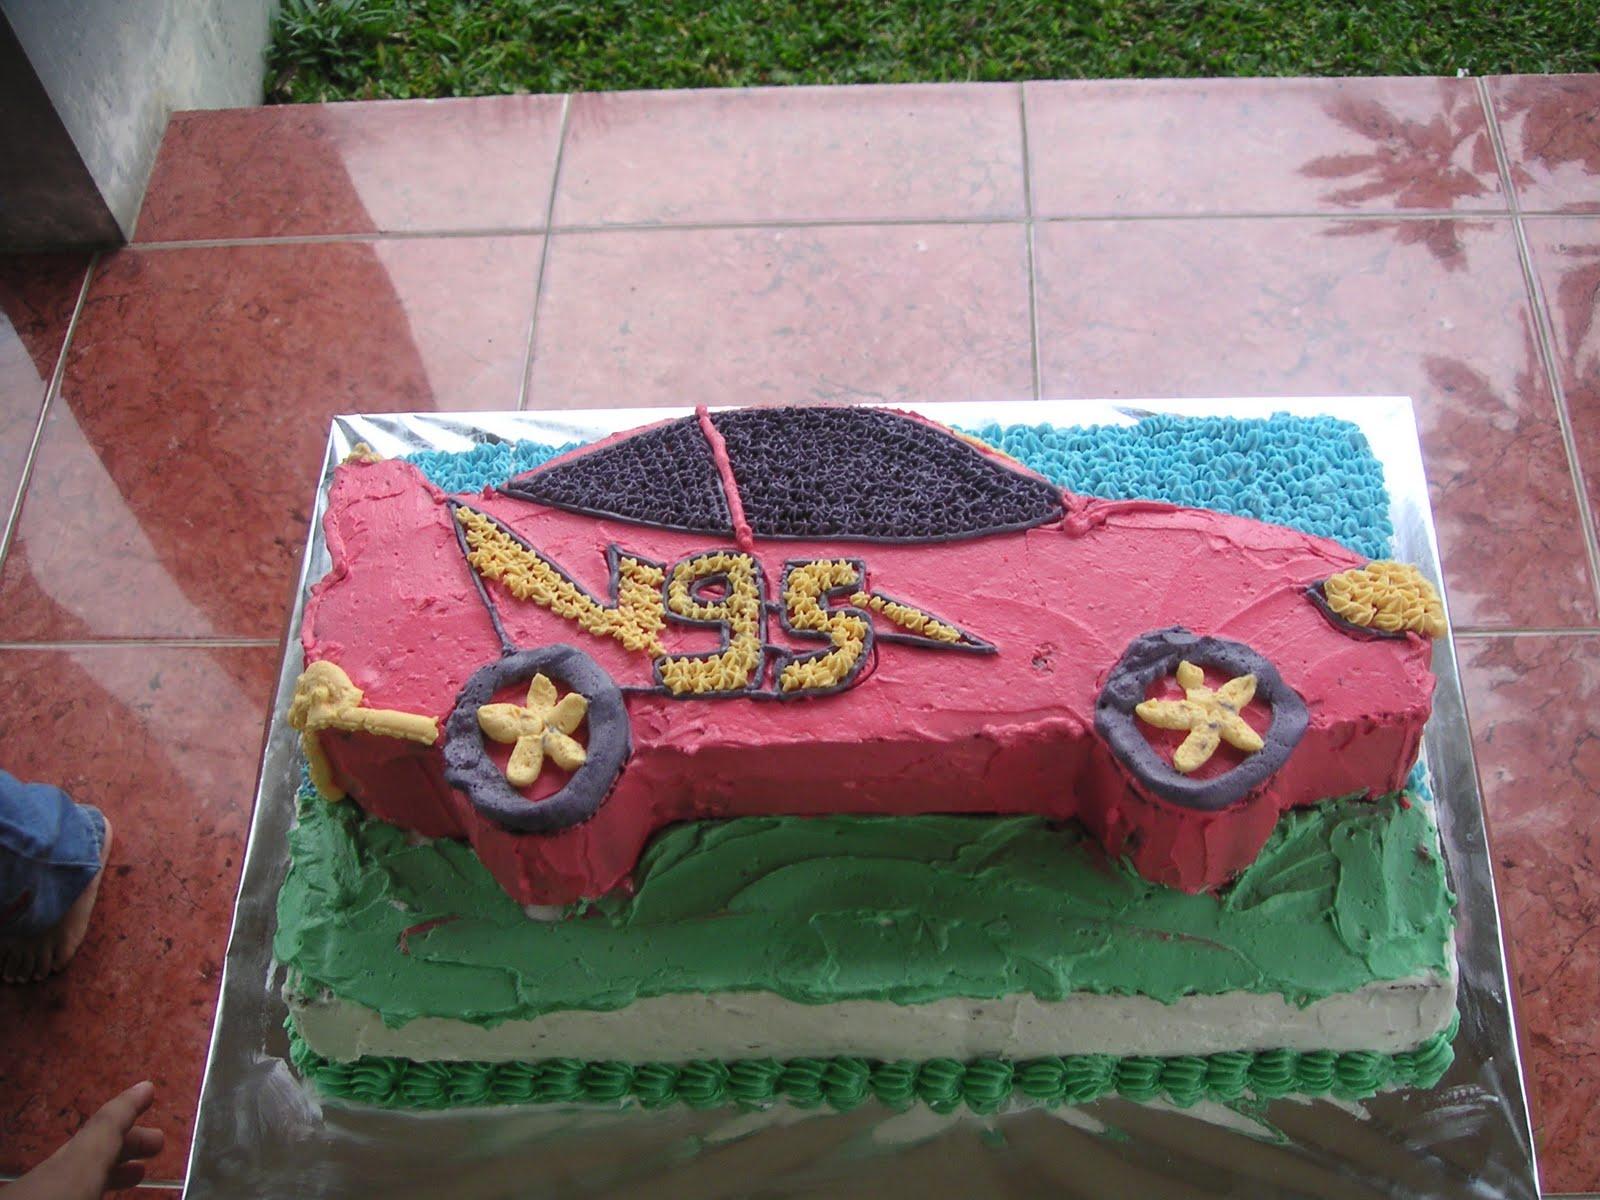 kue ulang tahun nazhif yang ke 4 permintaannya adalah kue ulang tahun